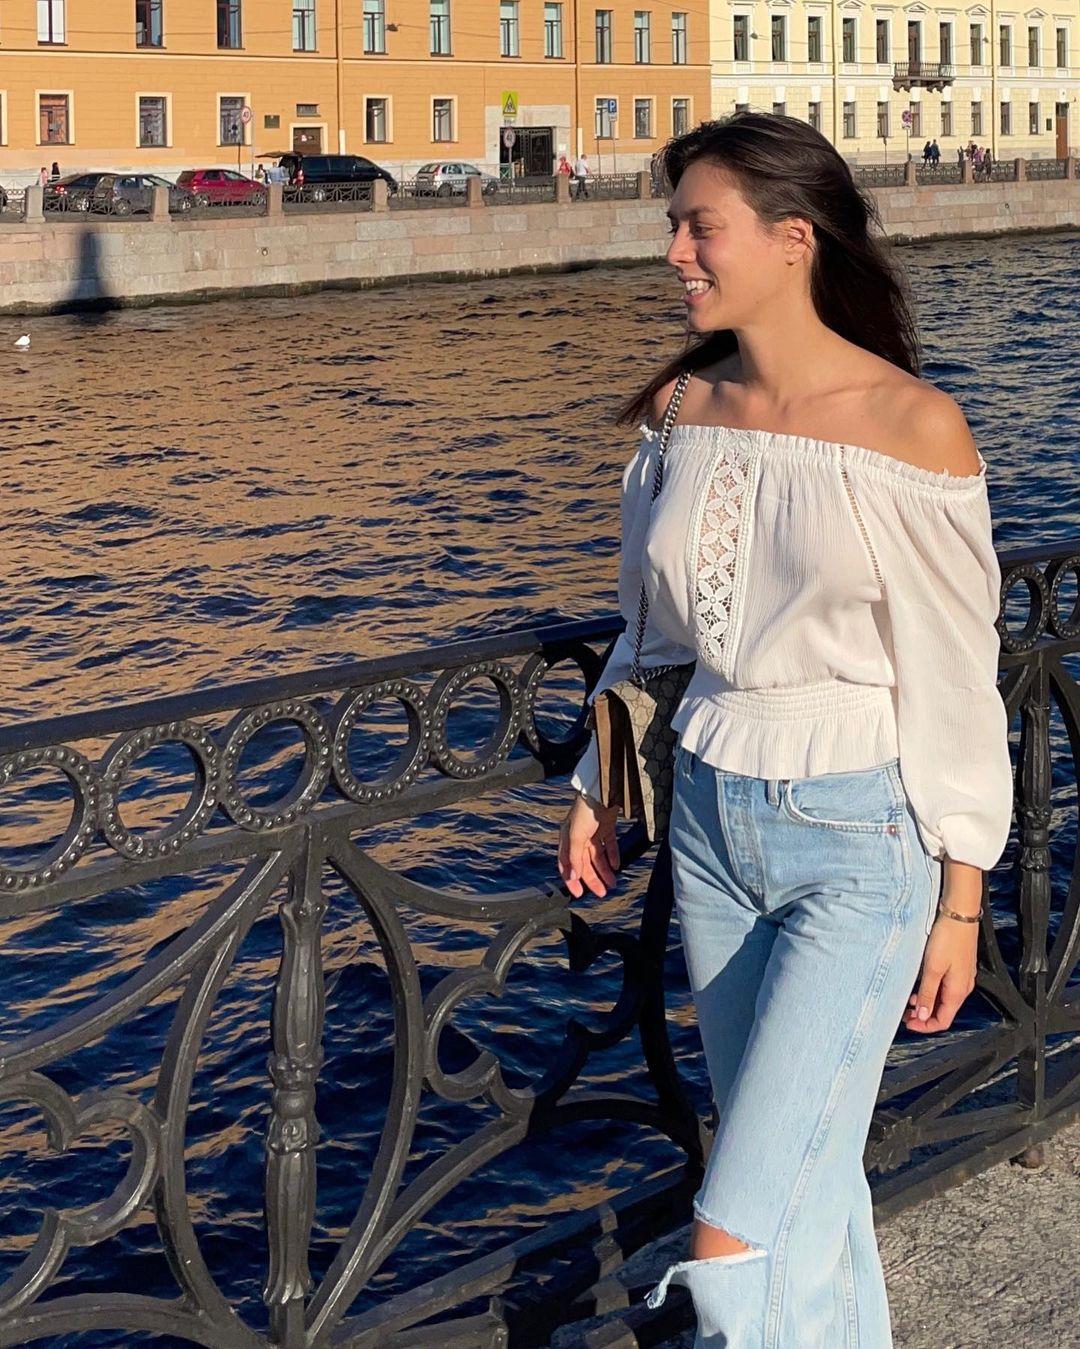 Alina-Gamidova-Wallpapers-Insta-Fit-Bio-2